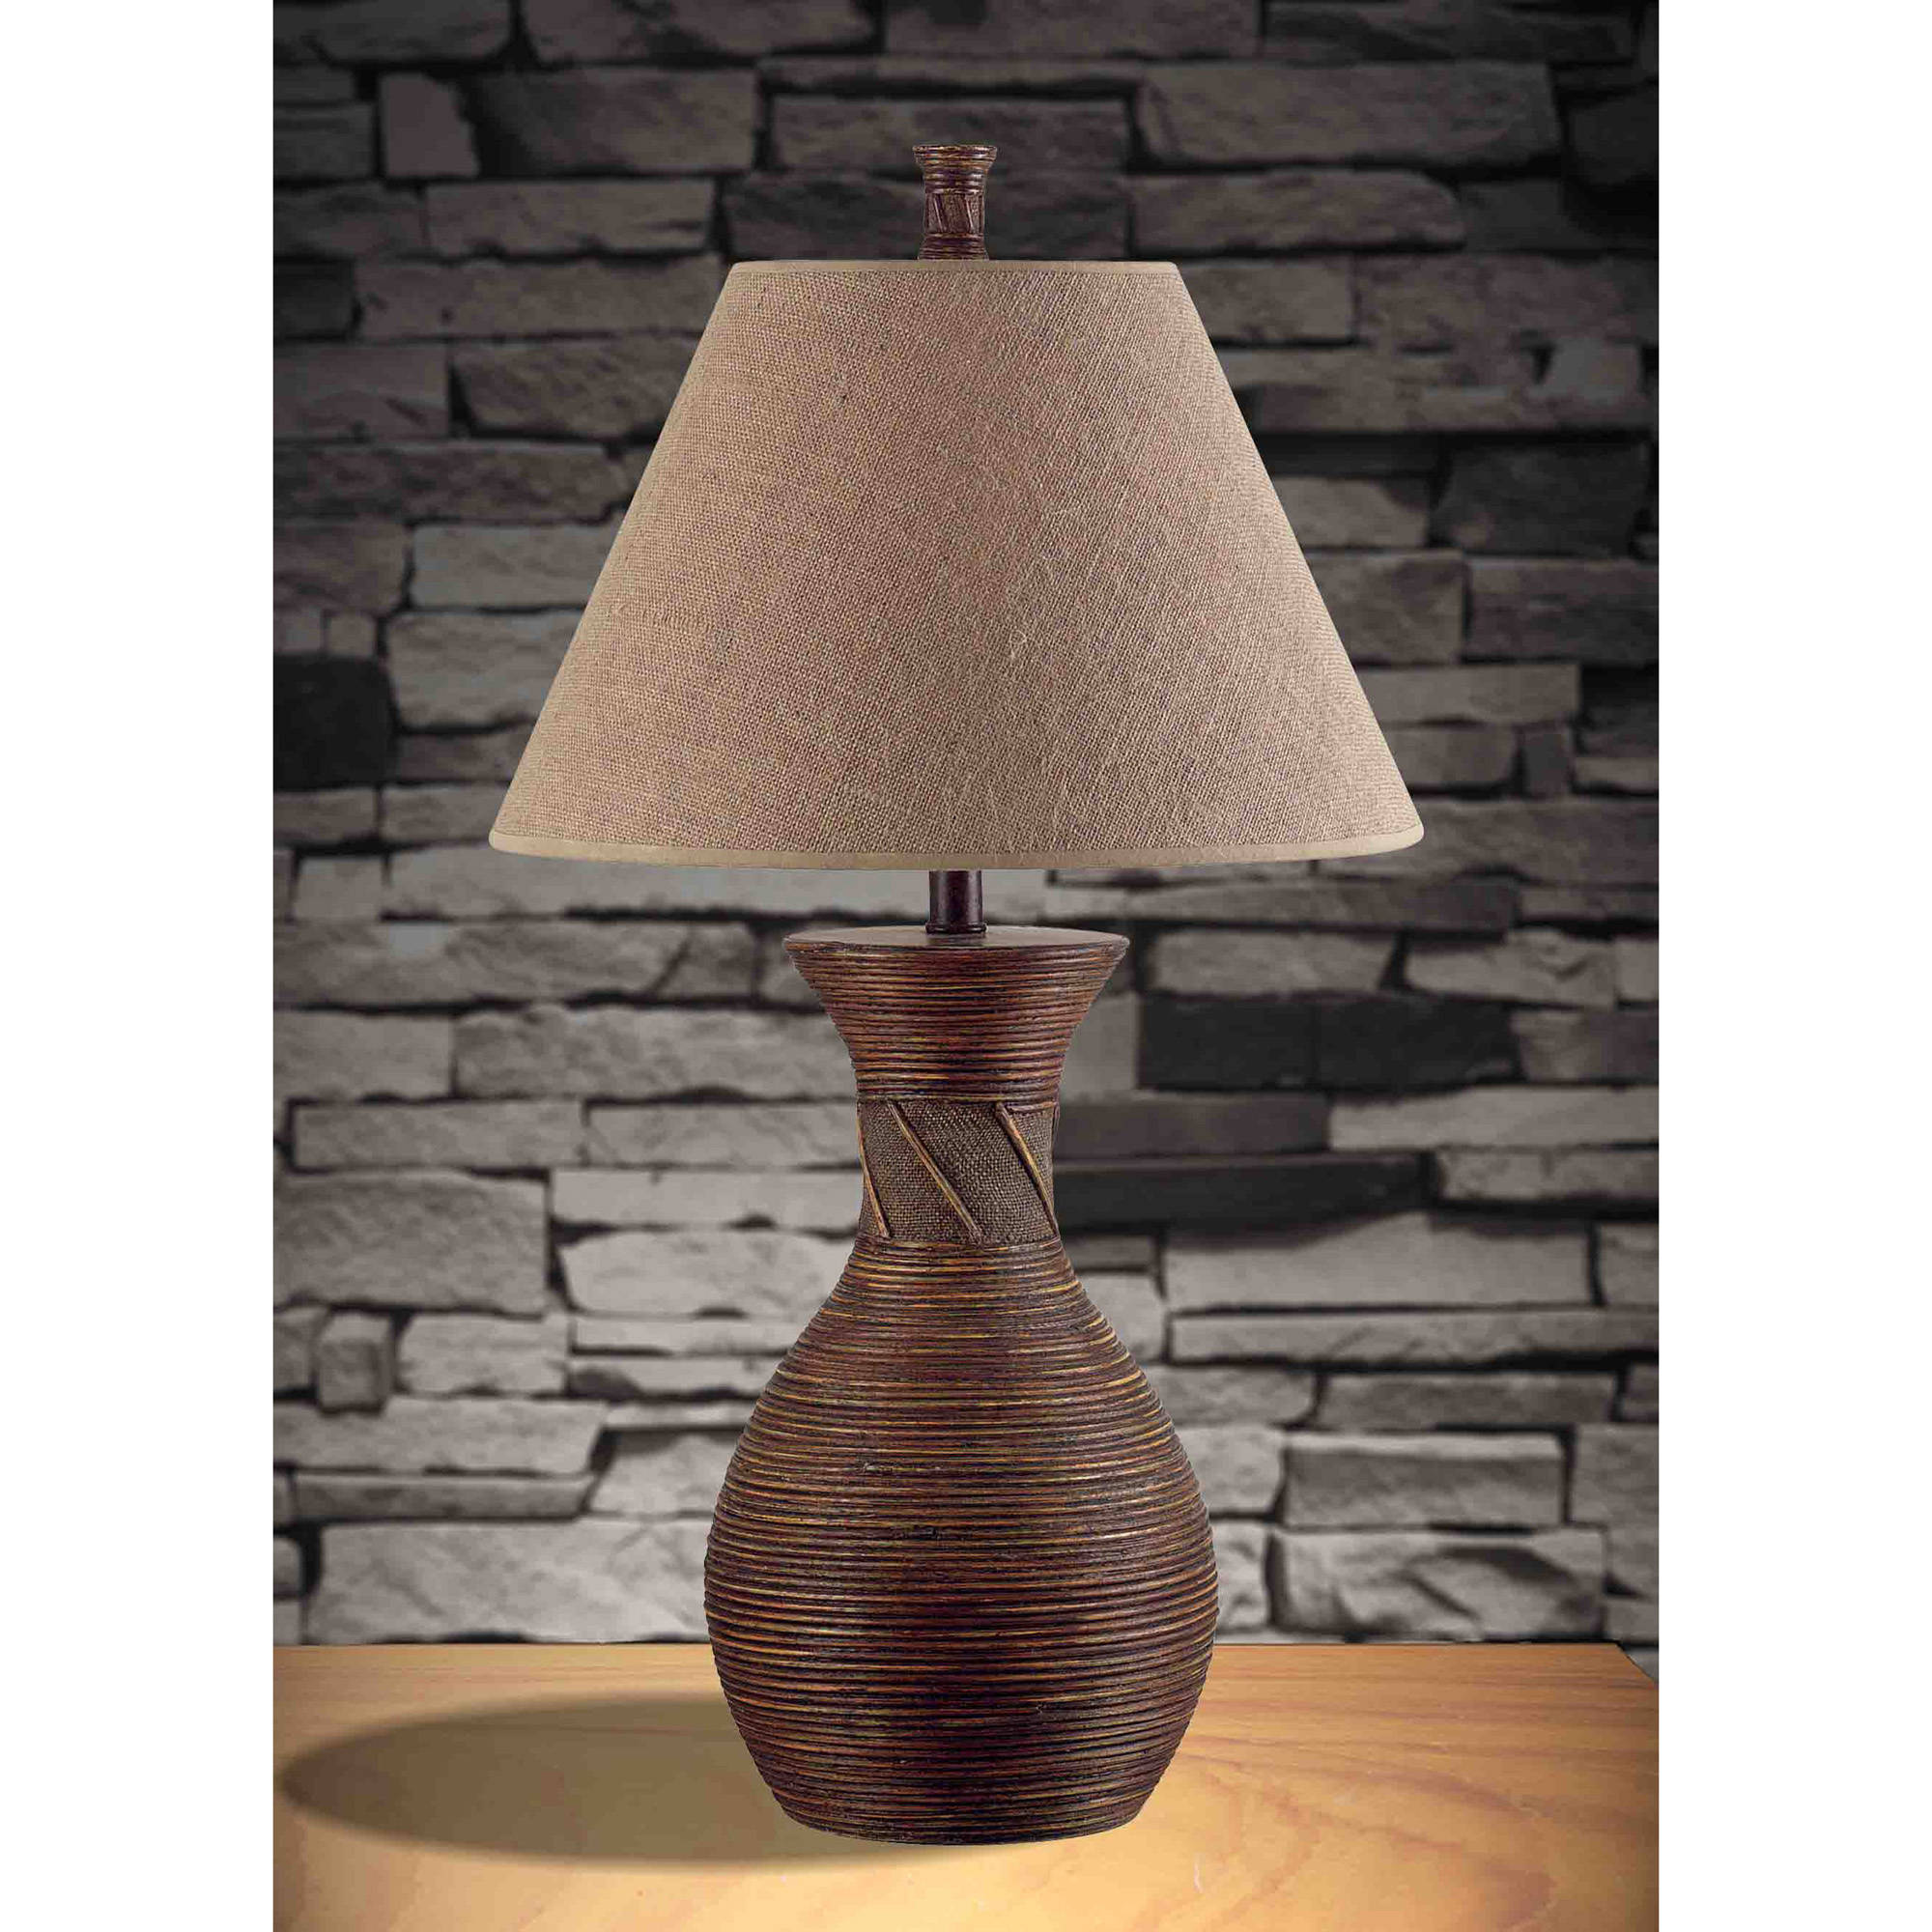 Kenroy Home Santiago Table Lamp, Natural Reed